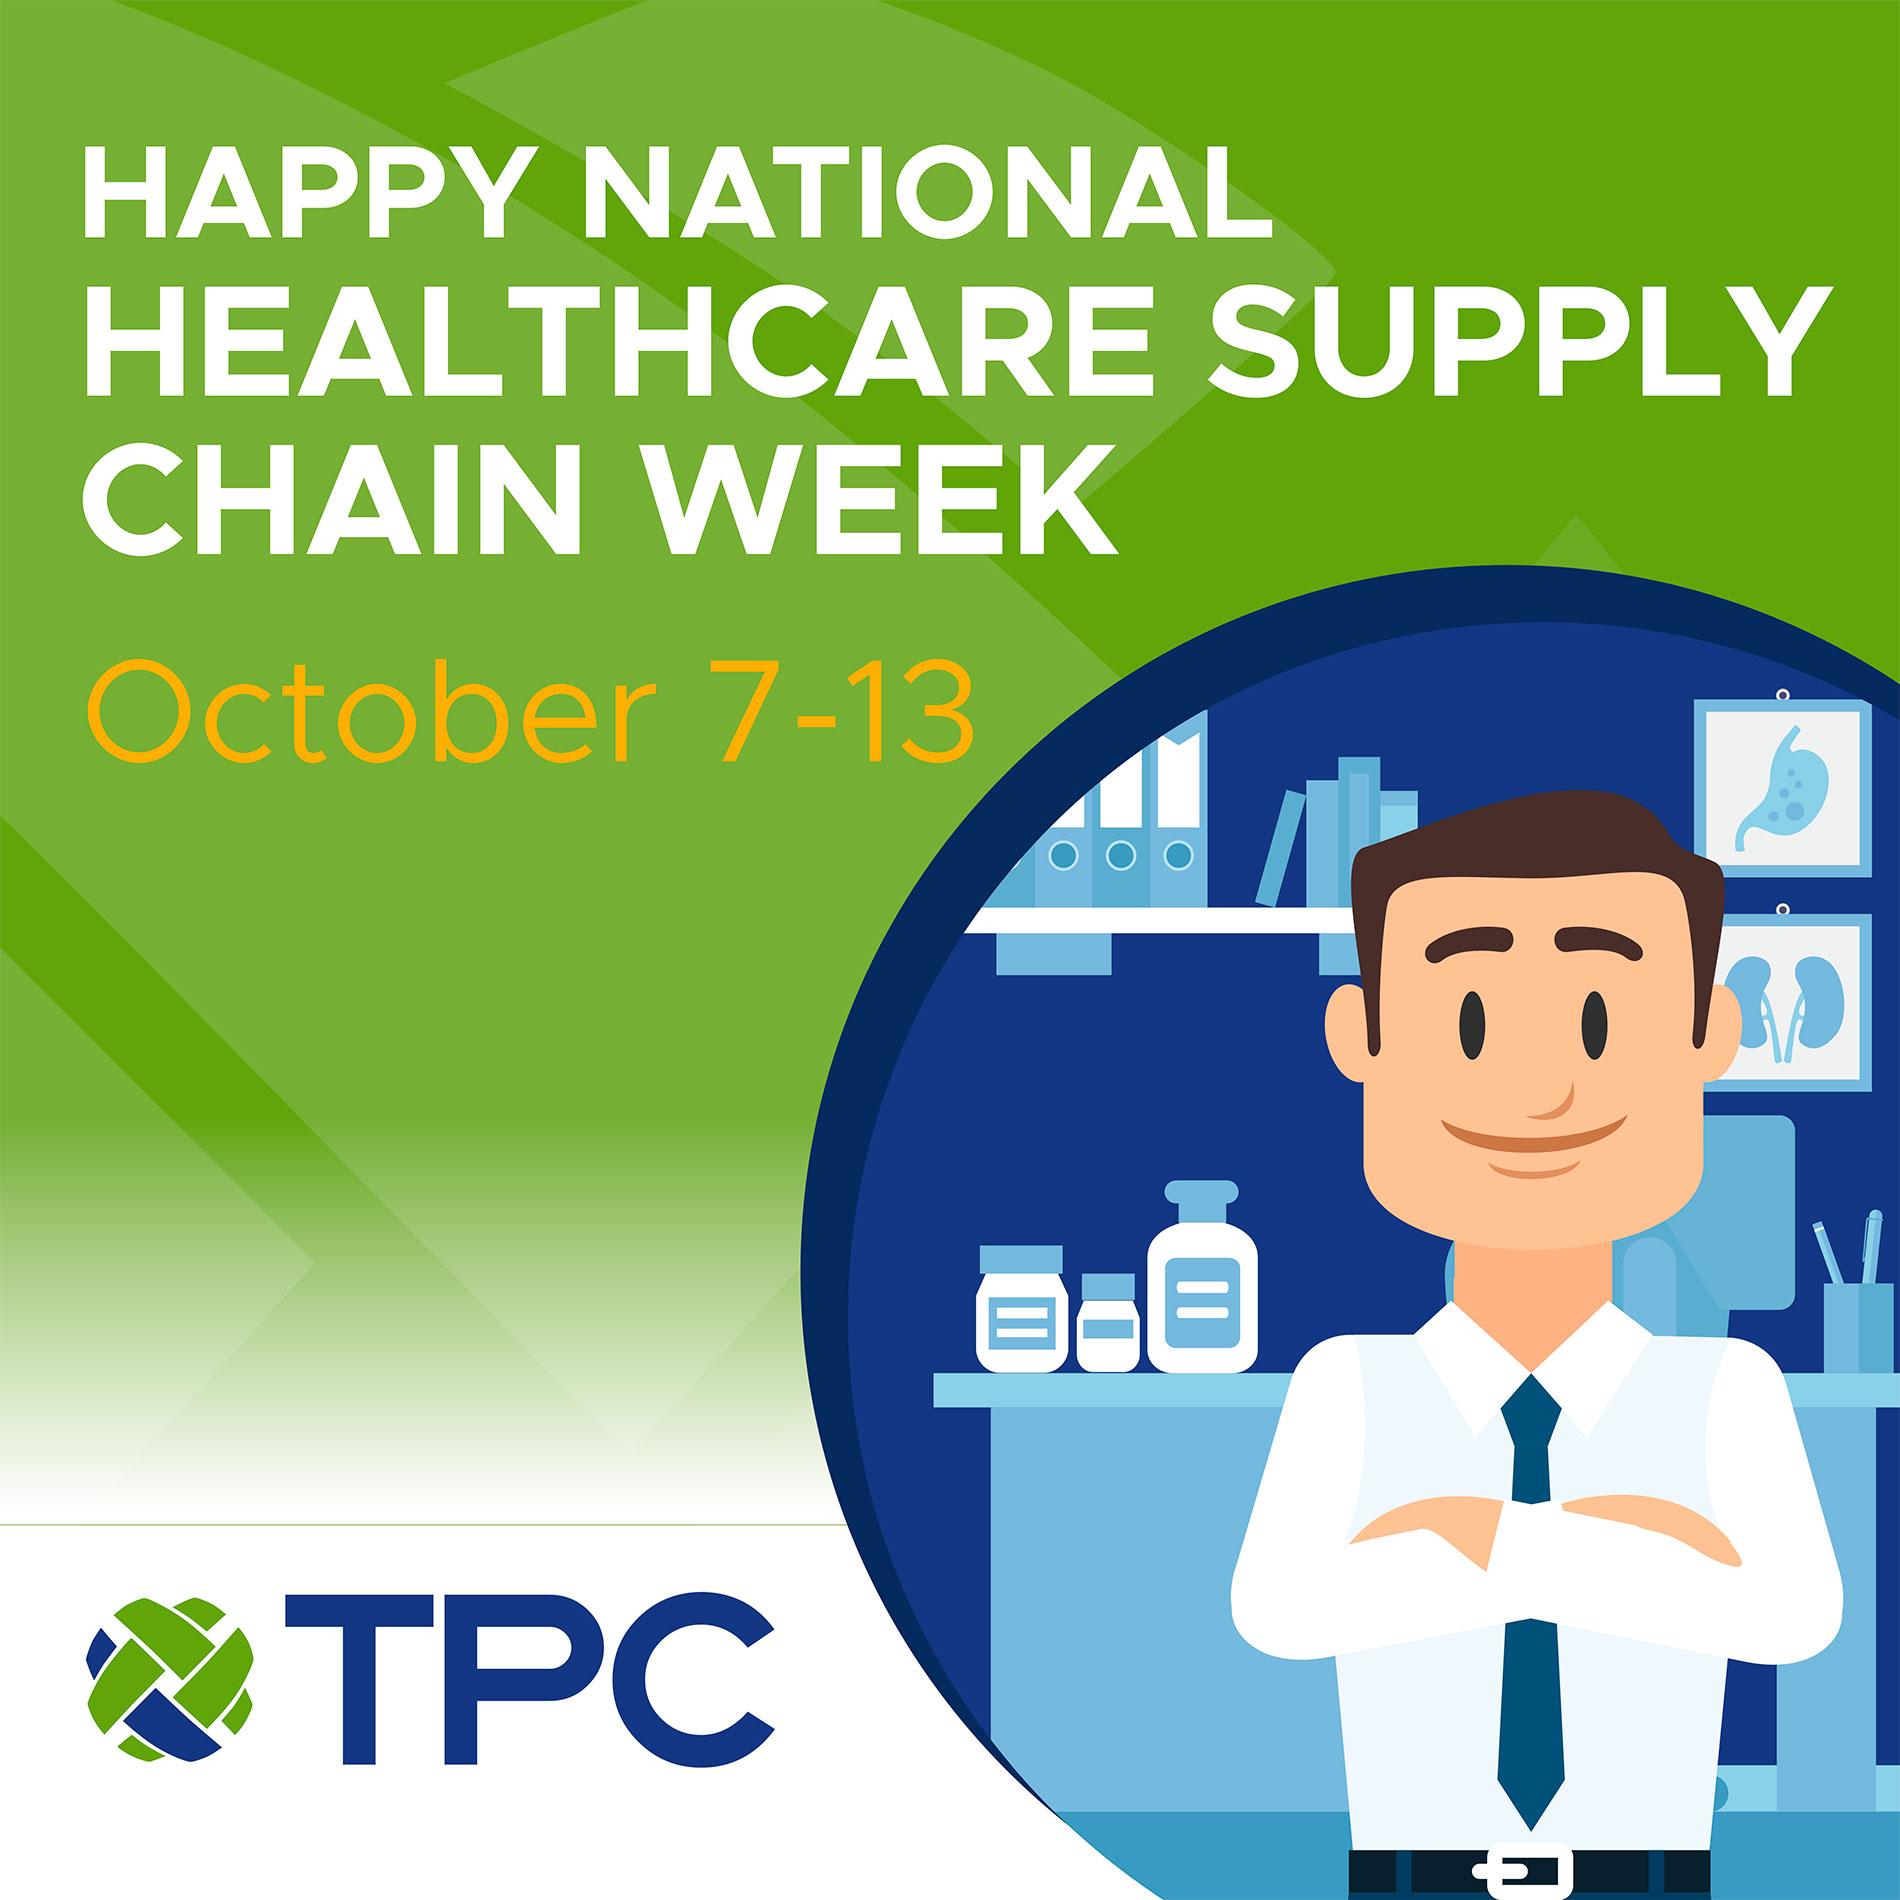 Happy-National-Healthcare-Supply-Chain-Week.jpg